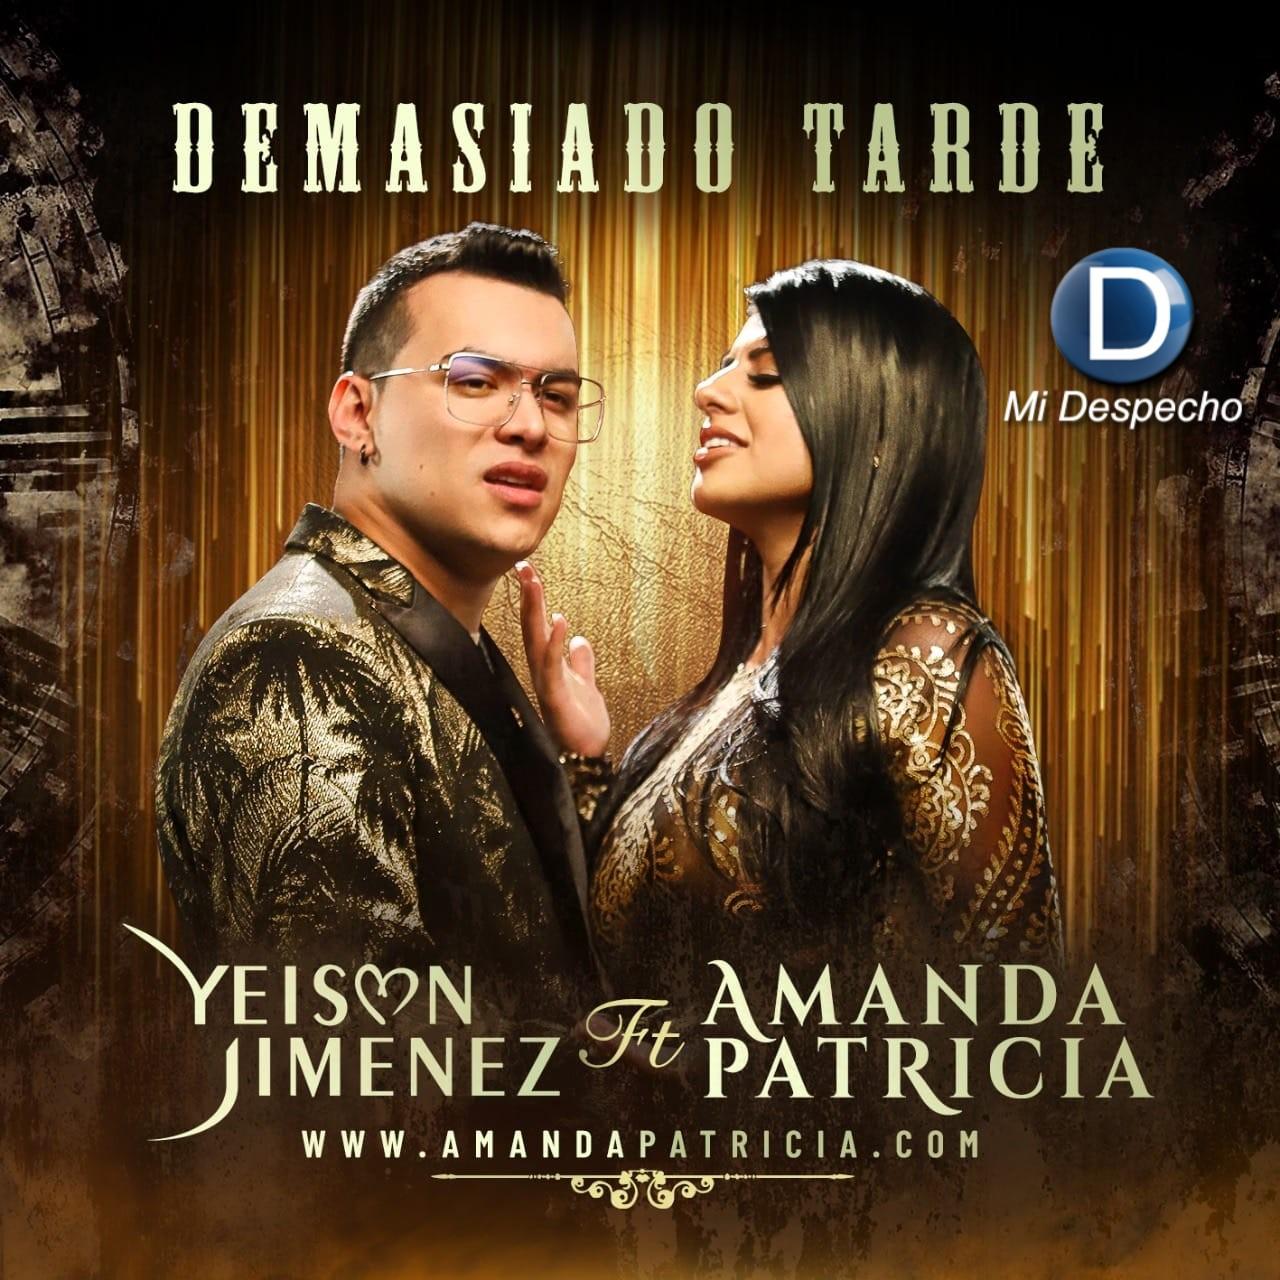 Amanda Patricia Ft. Yeison Jiménez Demasiado Tarde Frontal